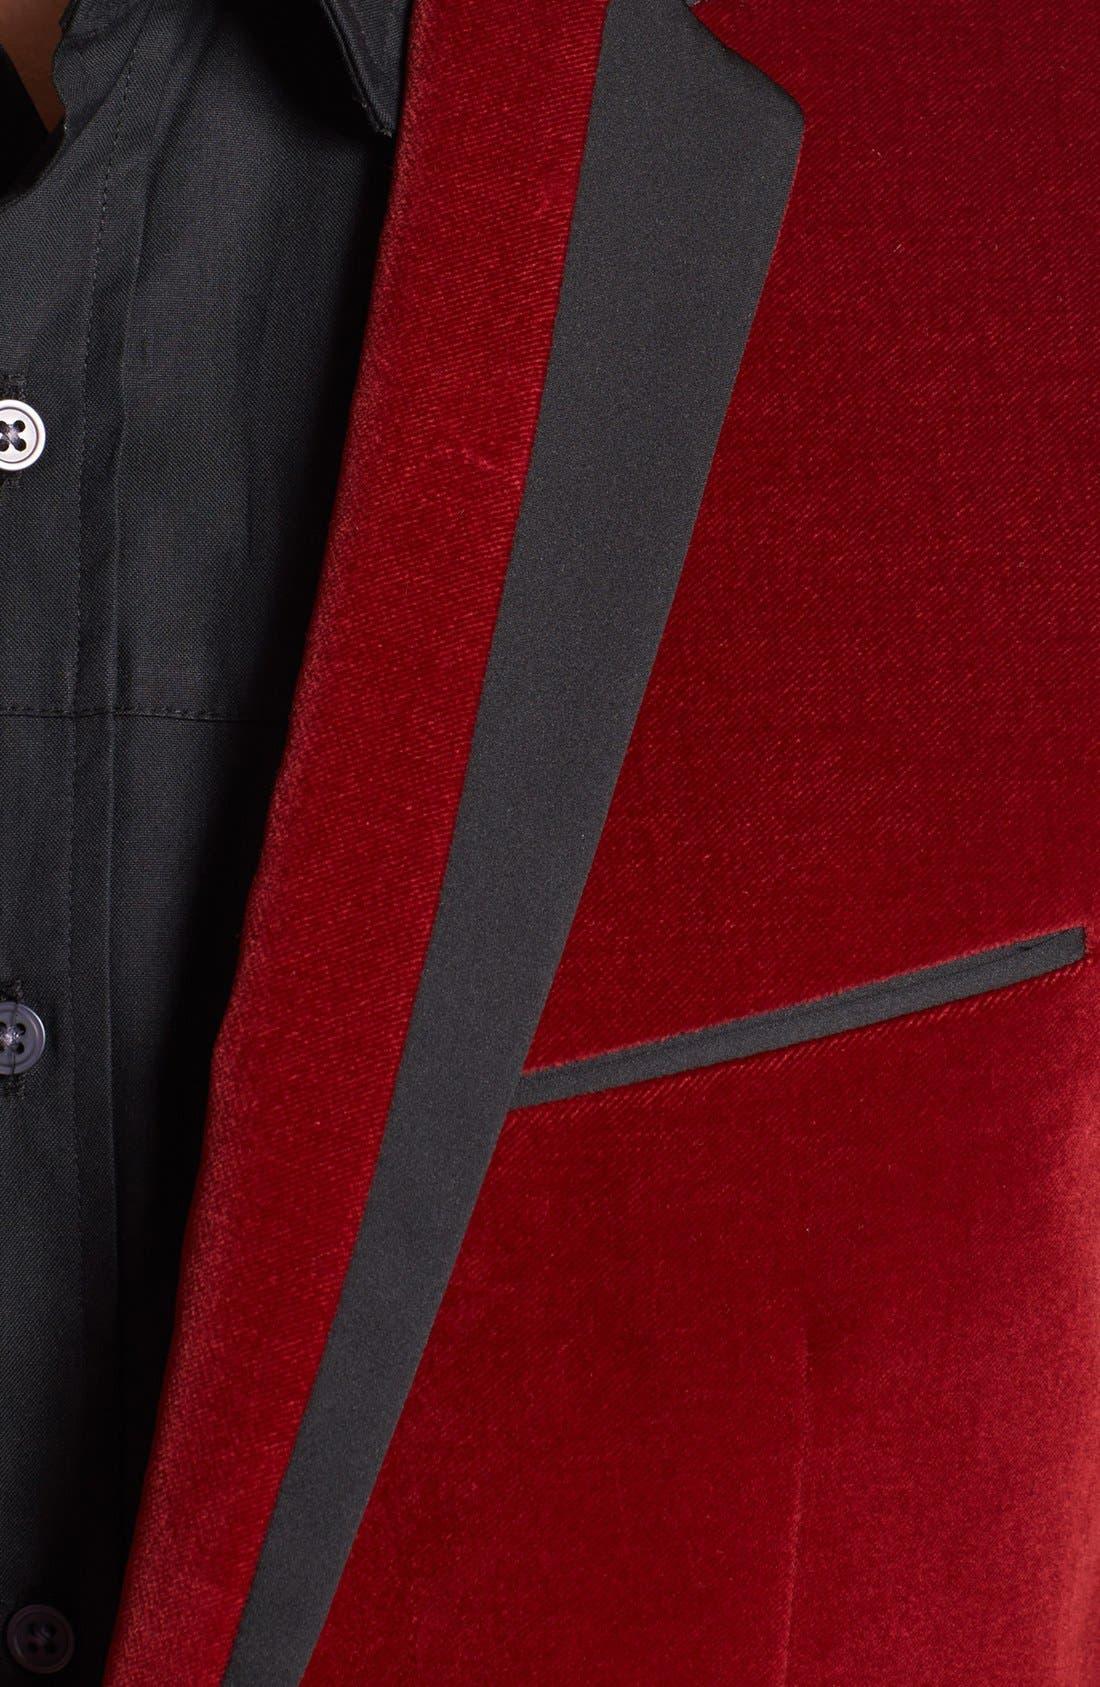 Alternate Image 2  - HUGO 'Askell' Trim Fit Velvet Dinner Jacket